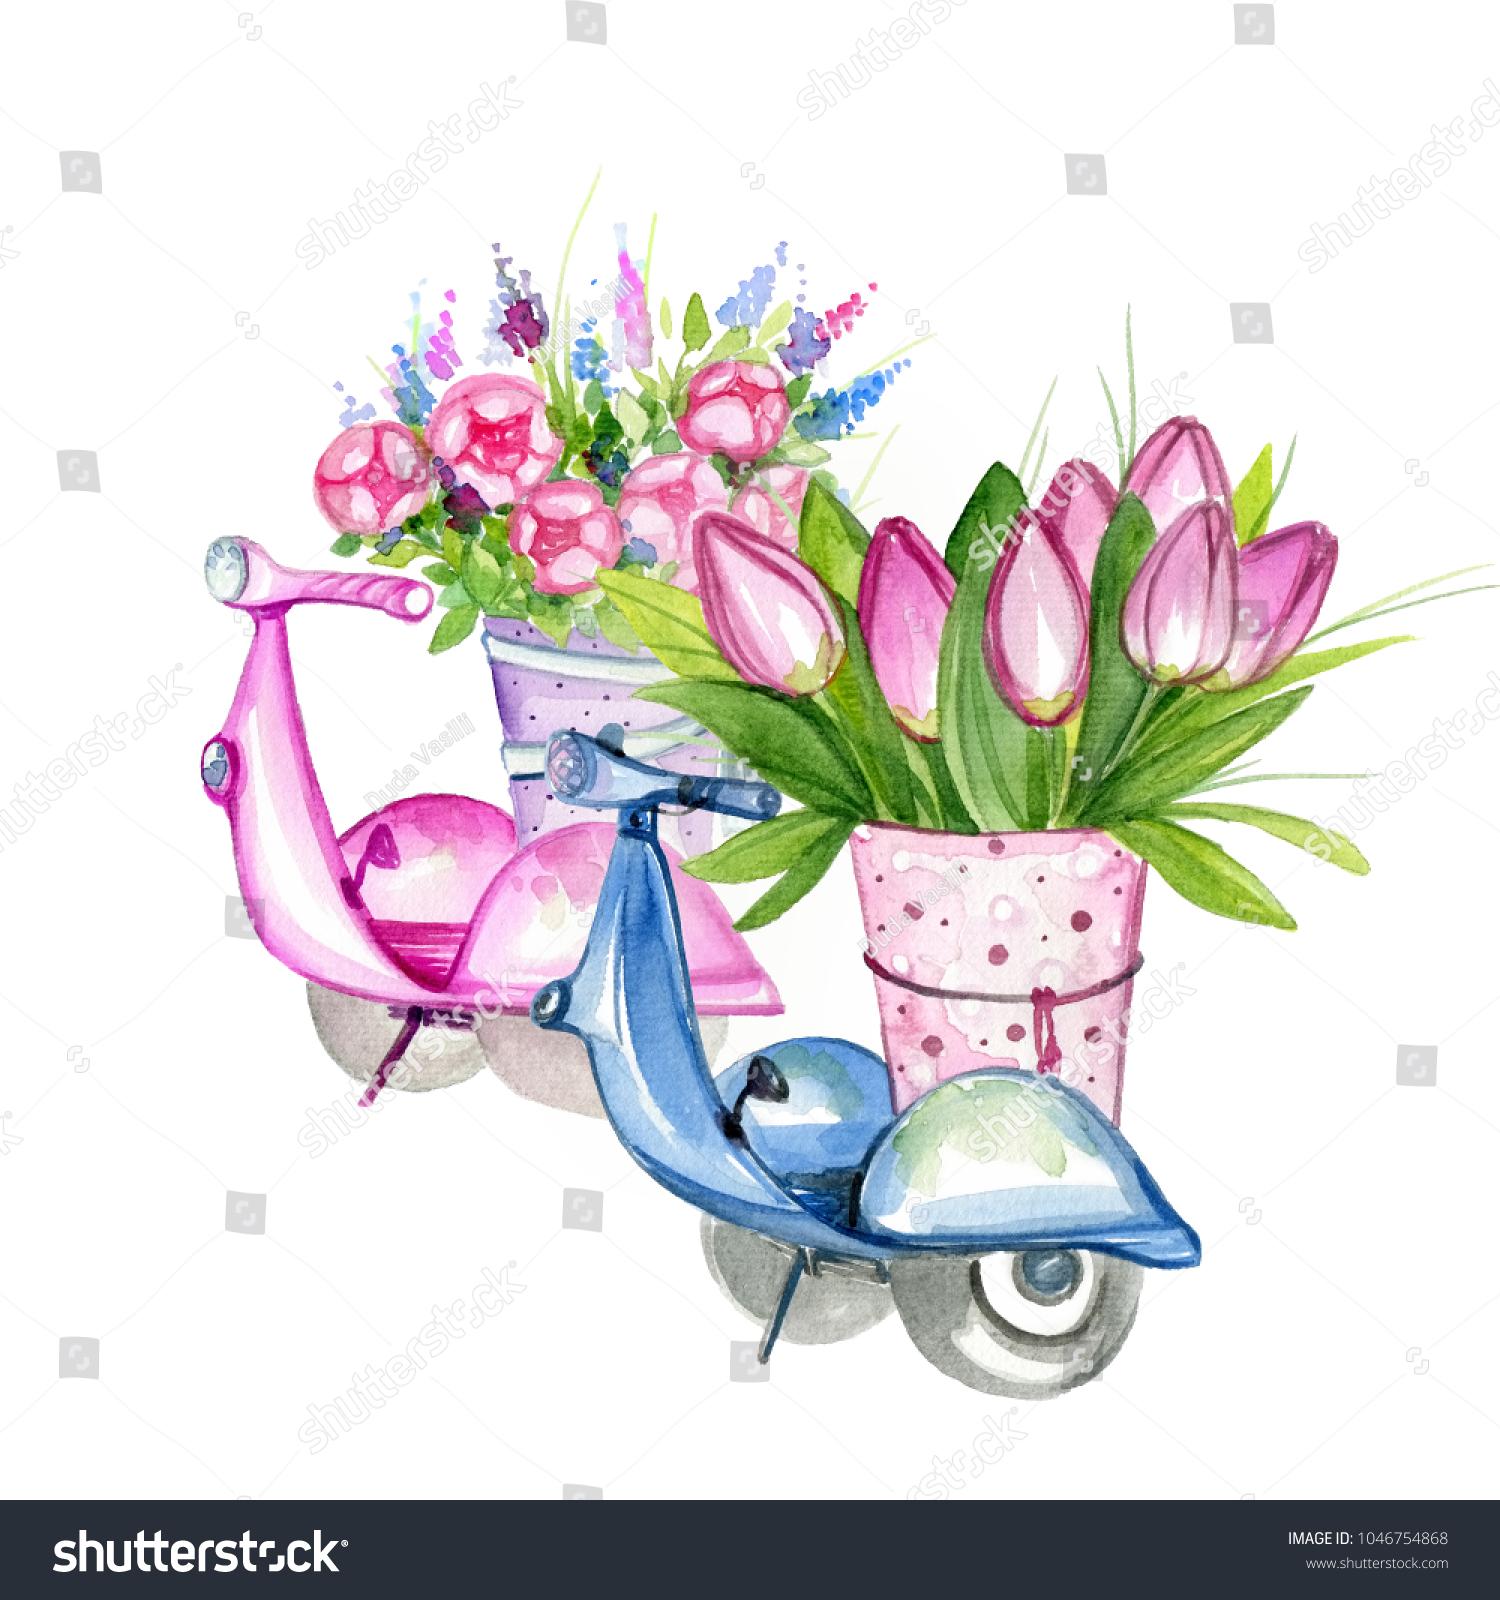 Two Retro Segways Beautiful Bouquets Flowers Stock Illustration ...